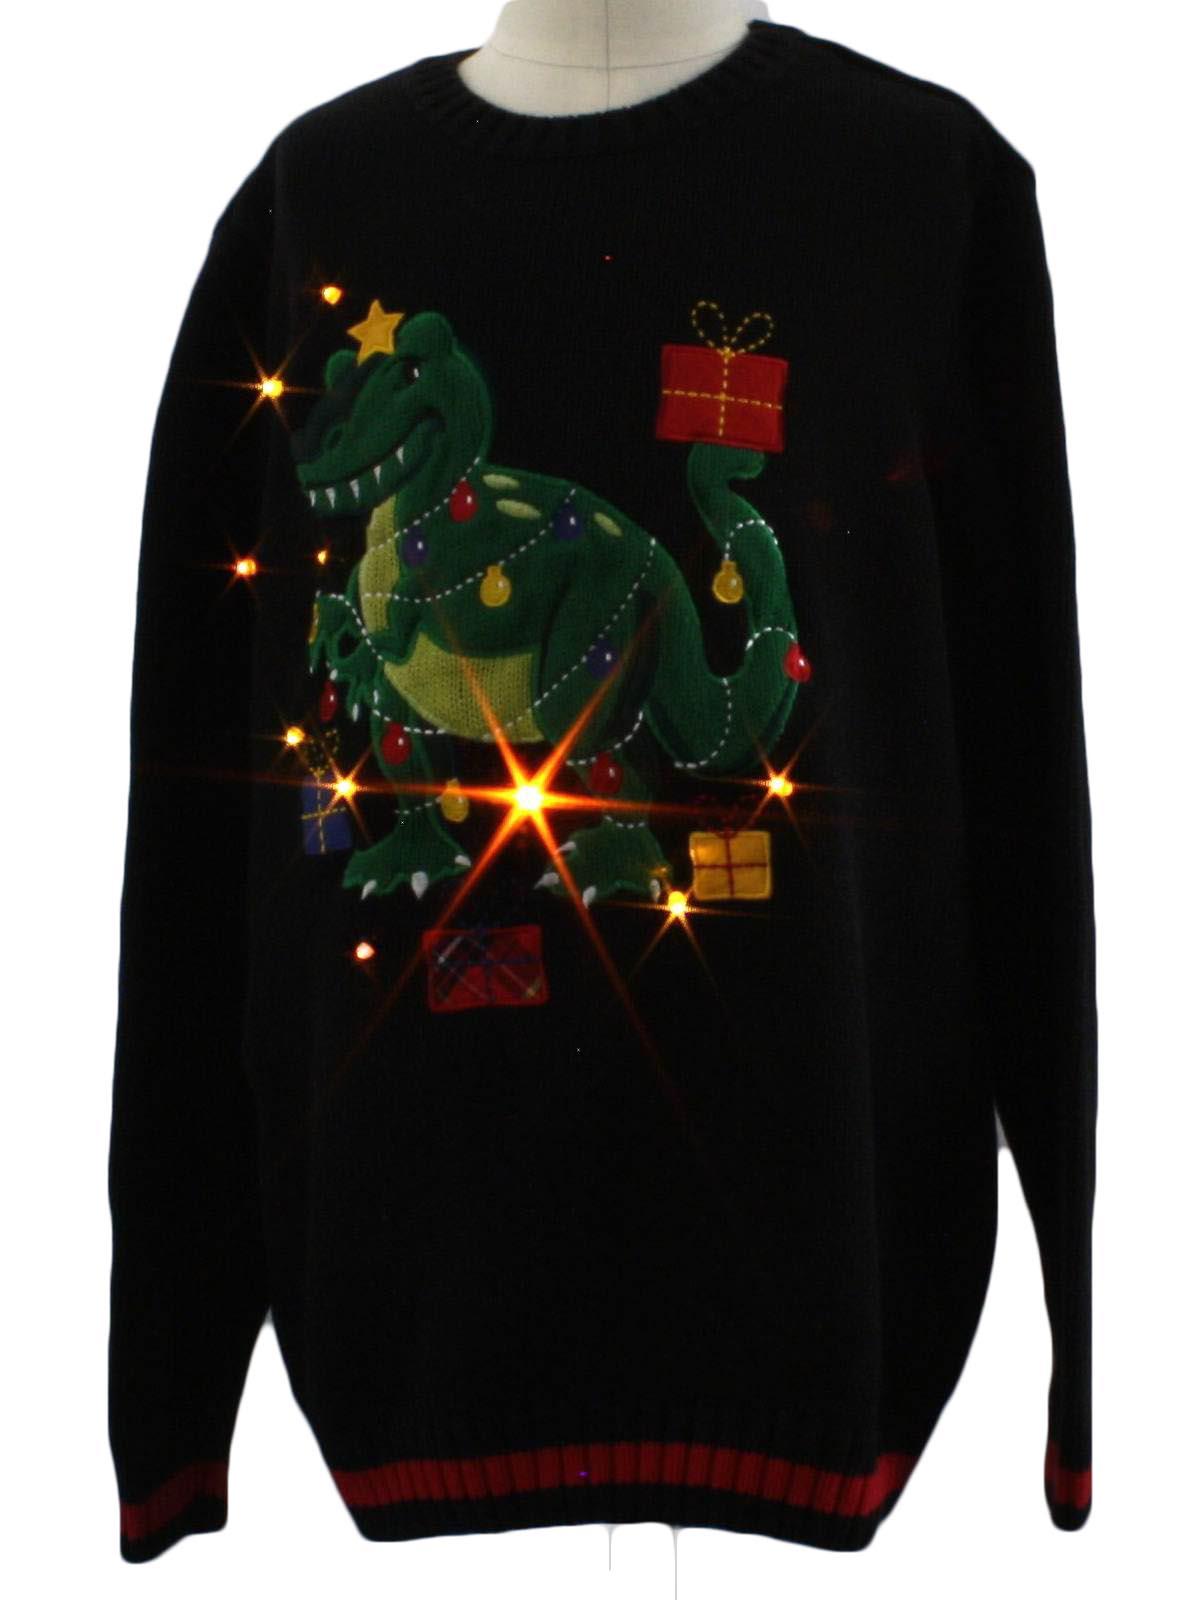 Childs Lightup Dinosaur Ugly Christmas Sweater: -Greendog- Unisex ...